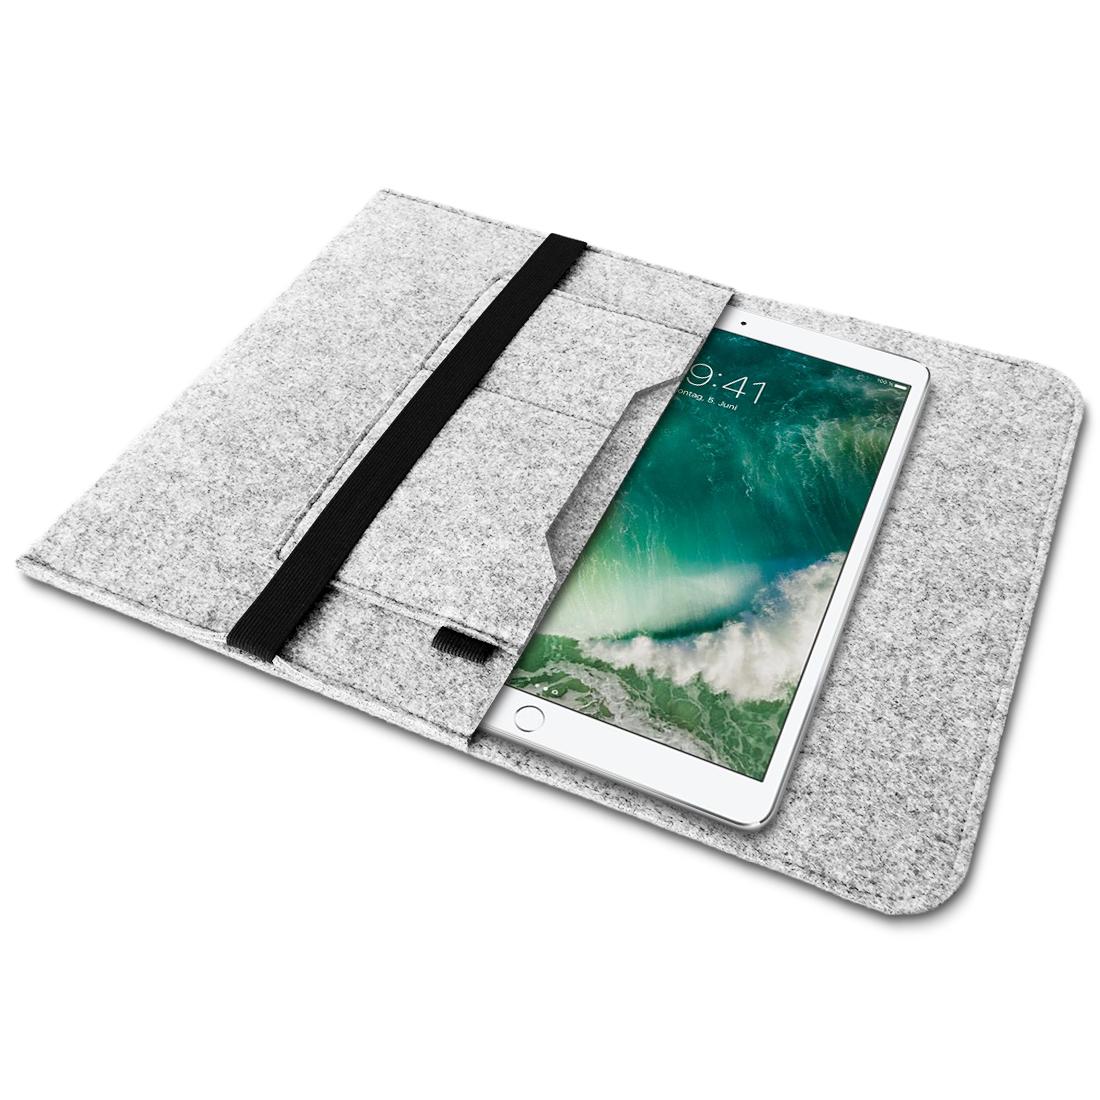 Tablet Tasche Apple iPad Air 20 20 20.20 Zoll Filz Hülle Sleeve Case  Schutzhülle